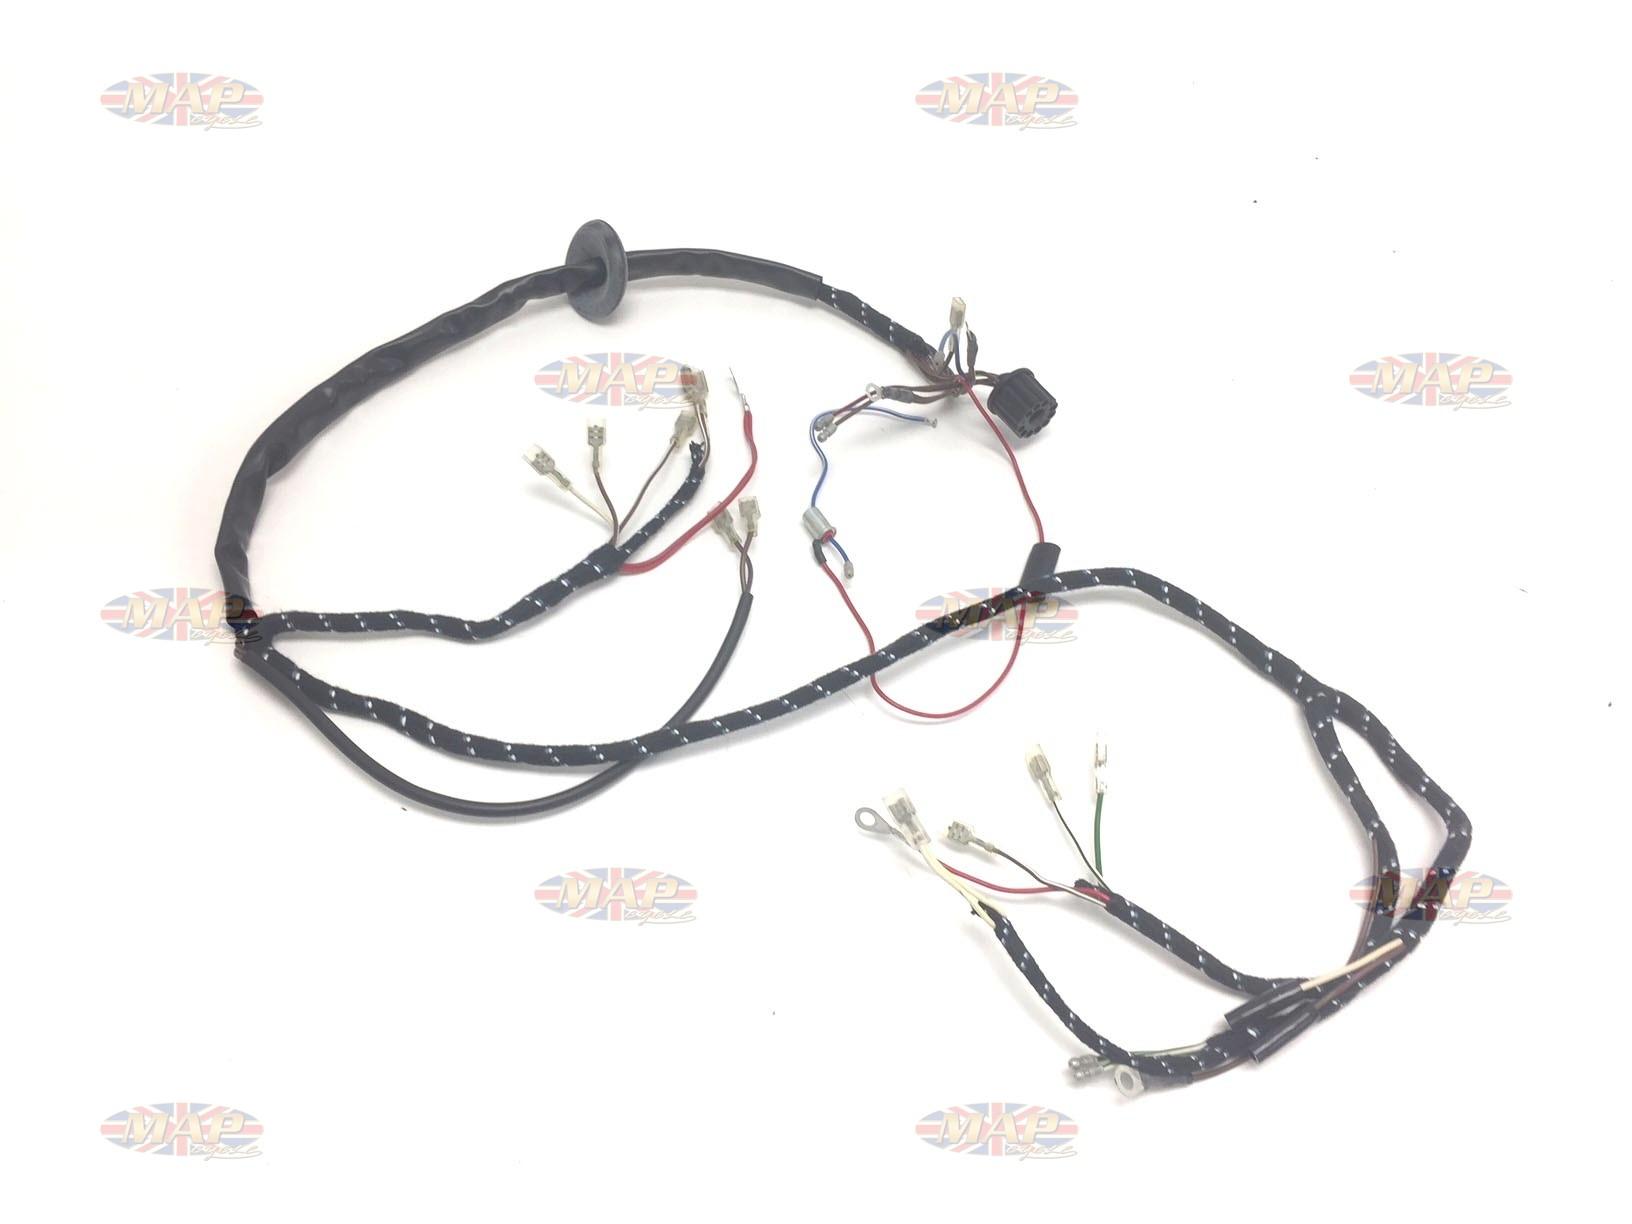 BSA 1967 A50 A65 Quality English-Made 12-volt Wiring Harness H129